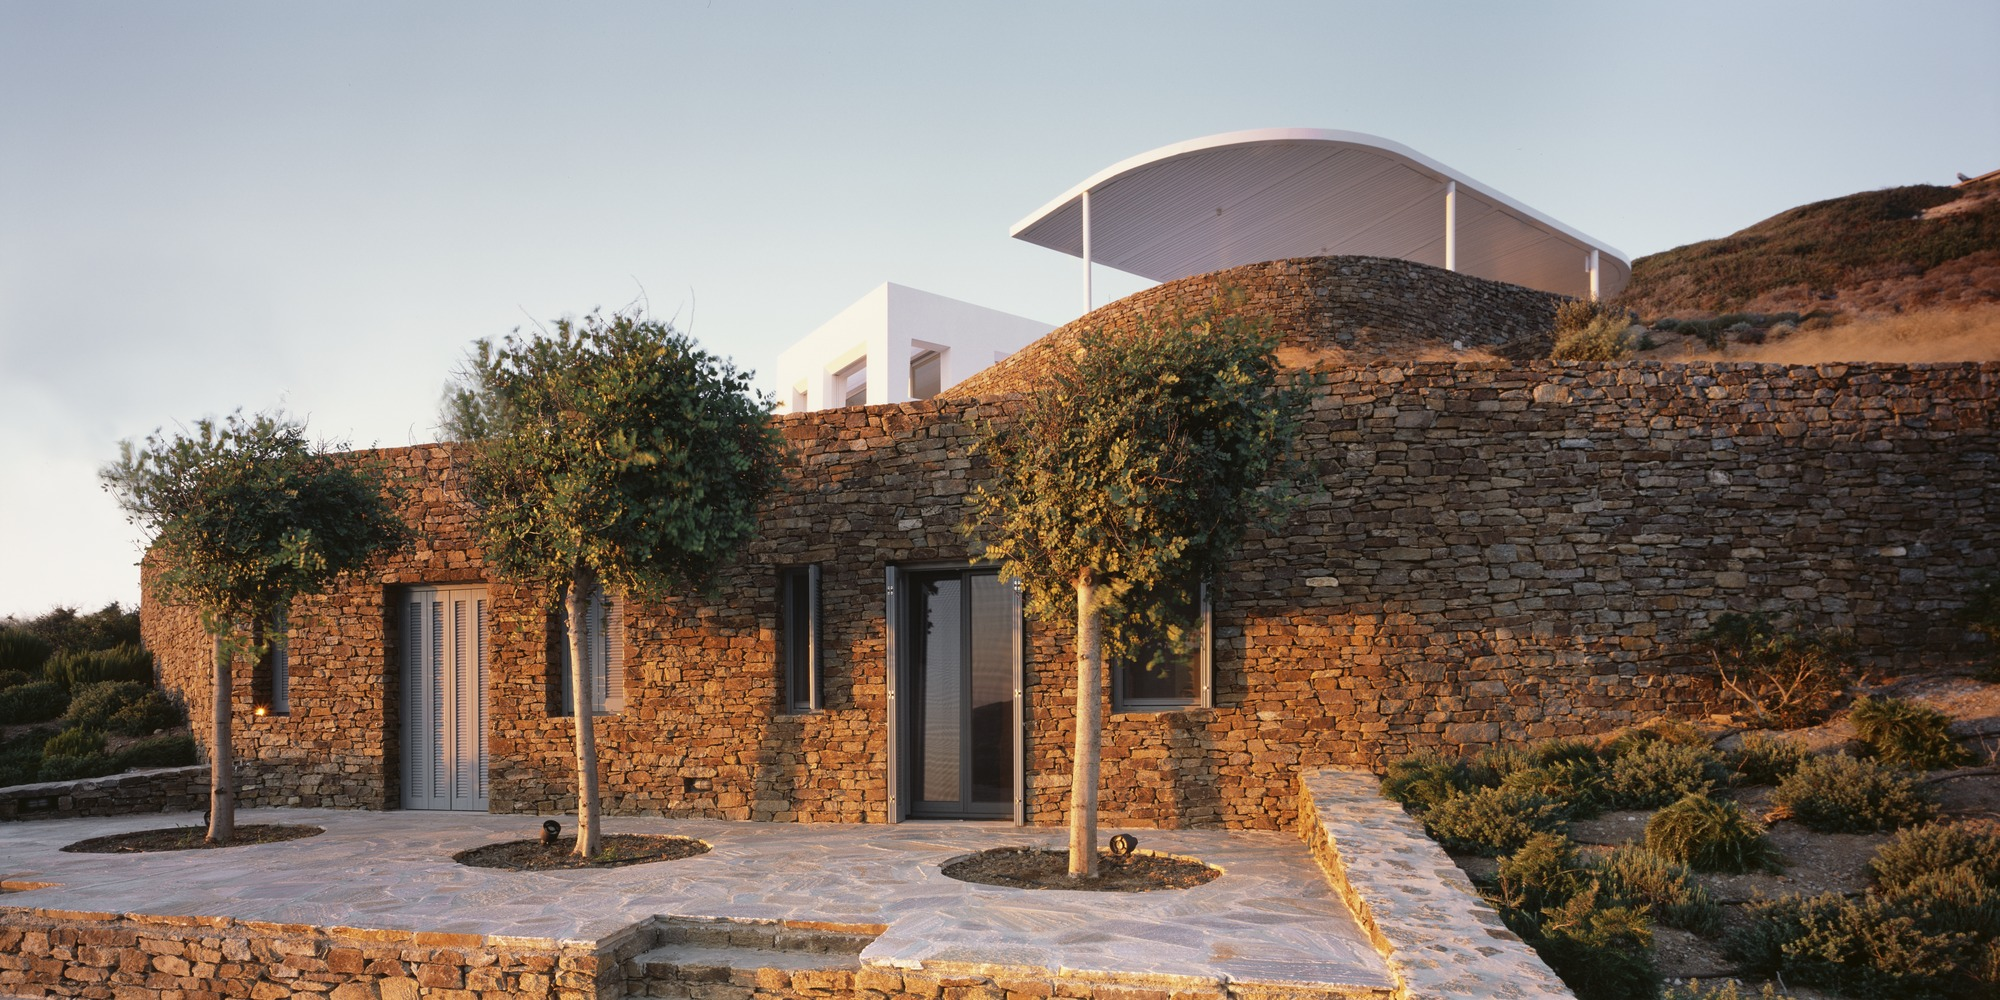 Avlakia House / ARP - Architecture Research Practice